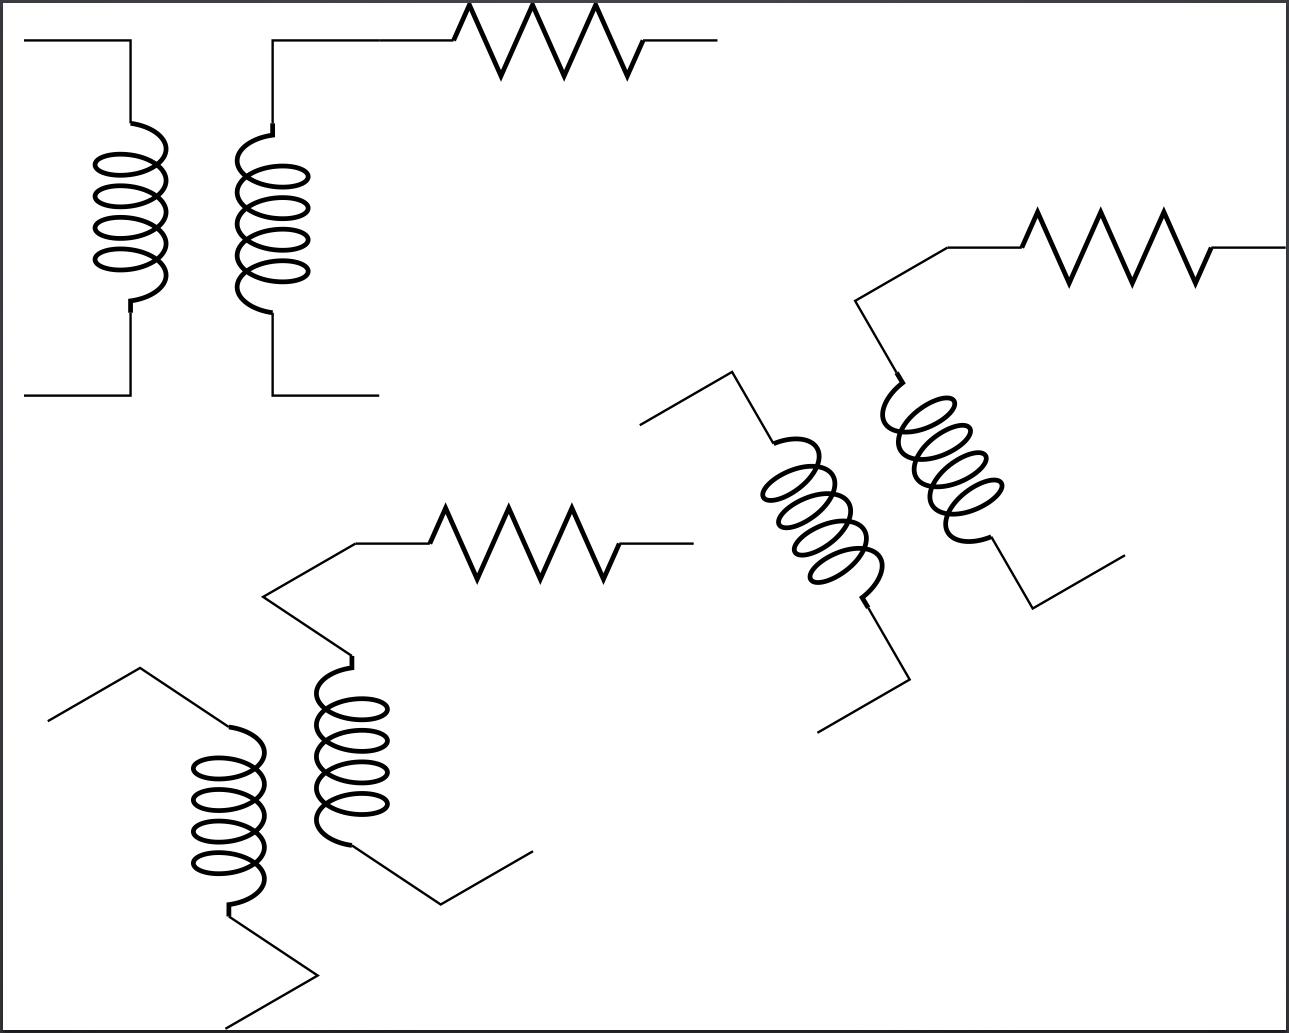 1289x1033 Circuitikz Rotate Transformer